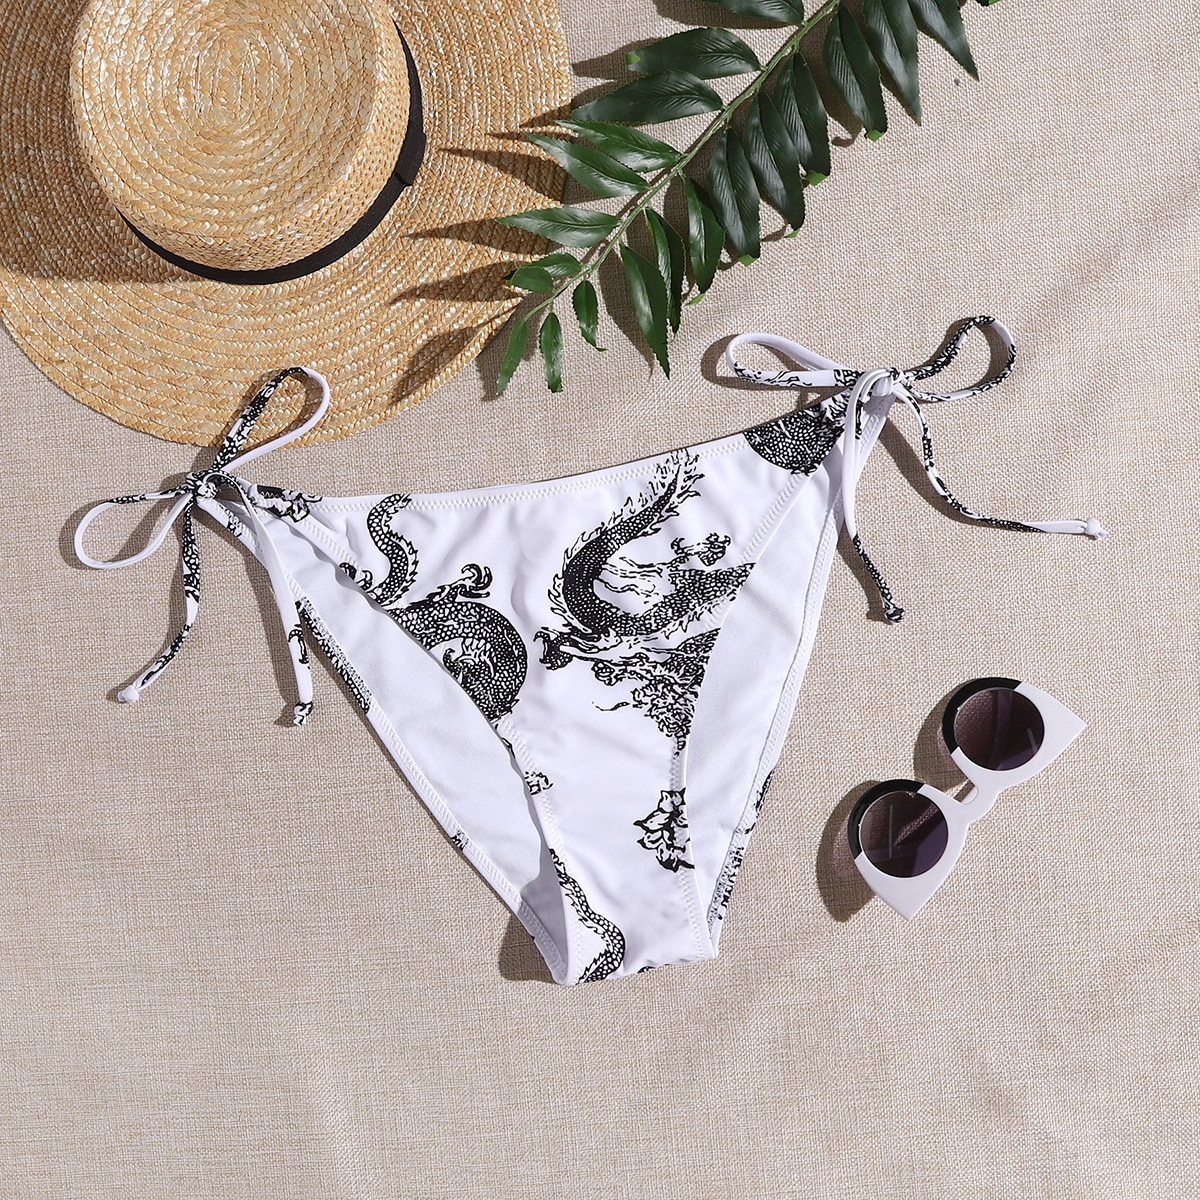 SHEIN Grote maat bikini bottom